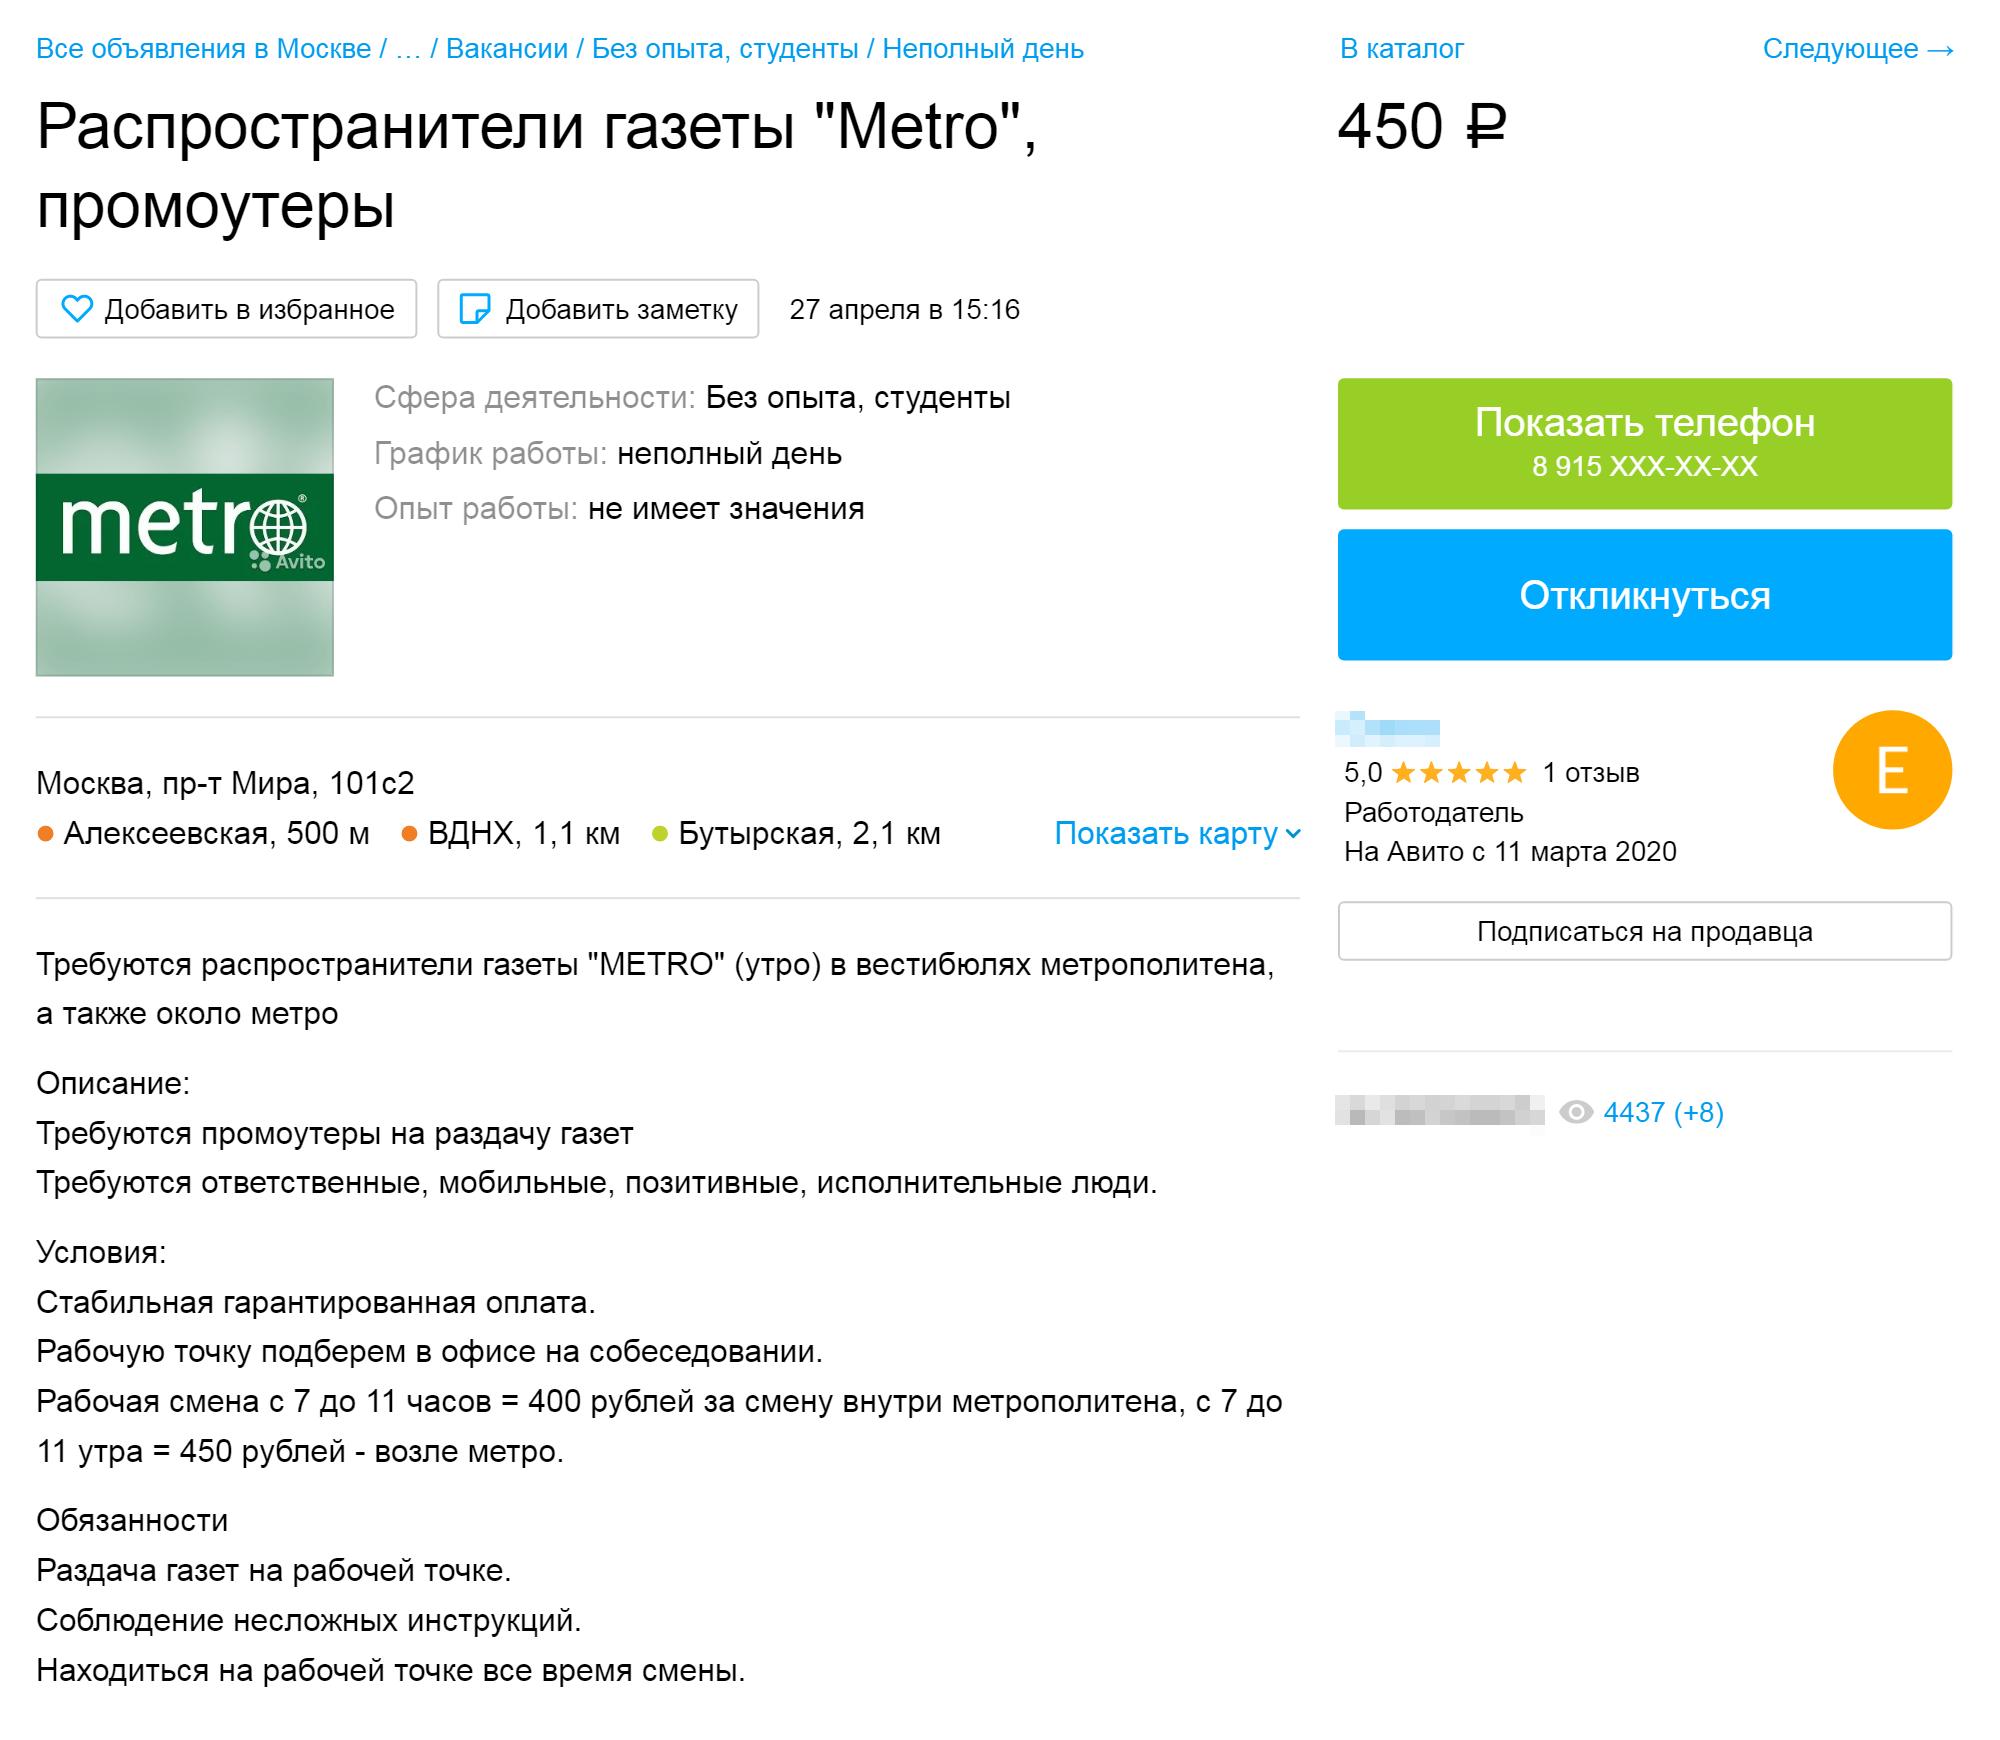 На «Авито» для&nbsp;подростков много вакансий промоутера. Например, за&nbsp;раздачу газет с&nbsp;7 до&nbsp;11 утра платят 400—450<span class=ruble>Р</span>